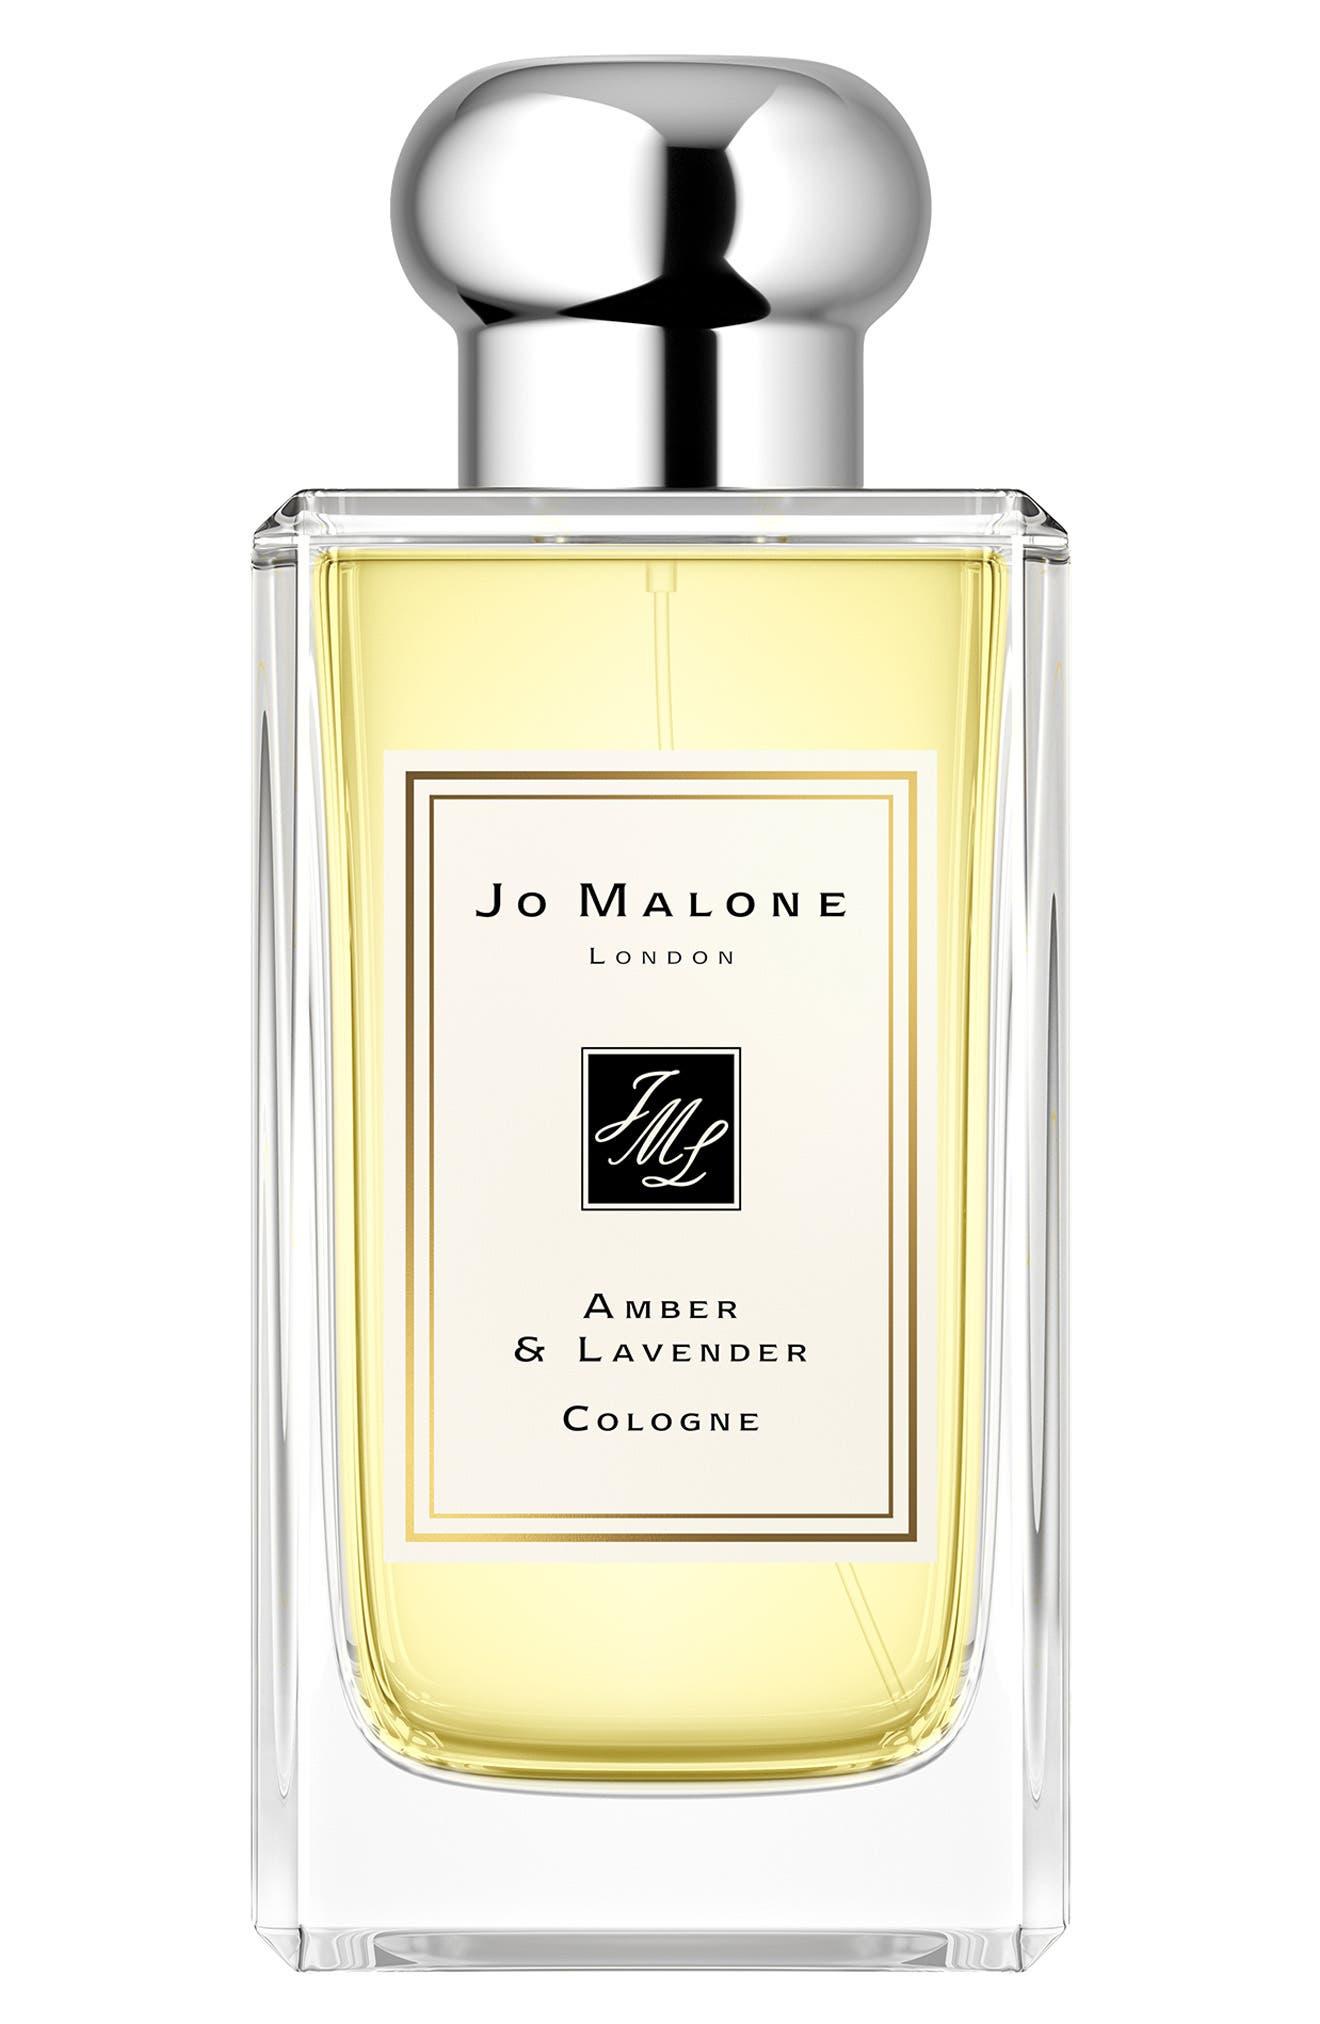 Jo Malone London(TM) Amber & Lavender Cologne